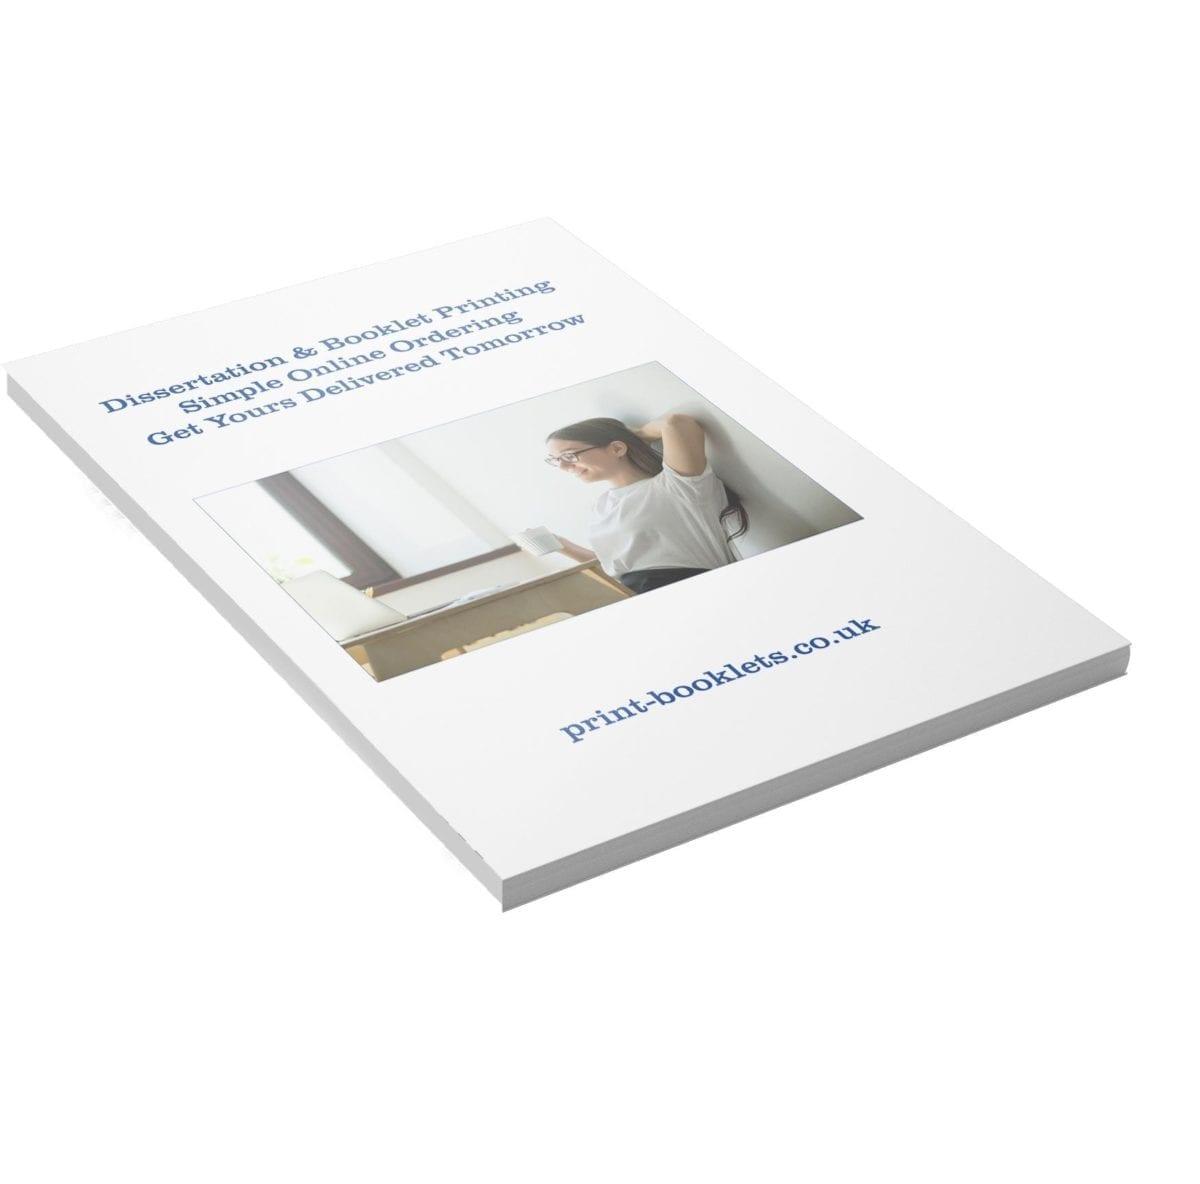 Apa citation for dissertations